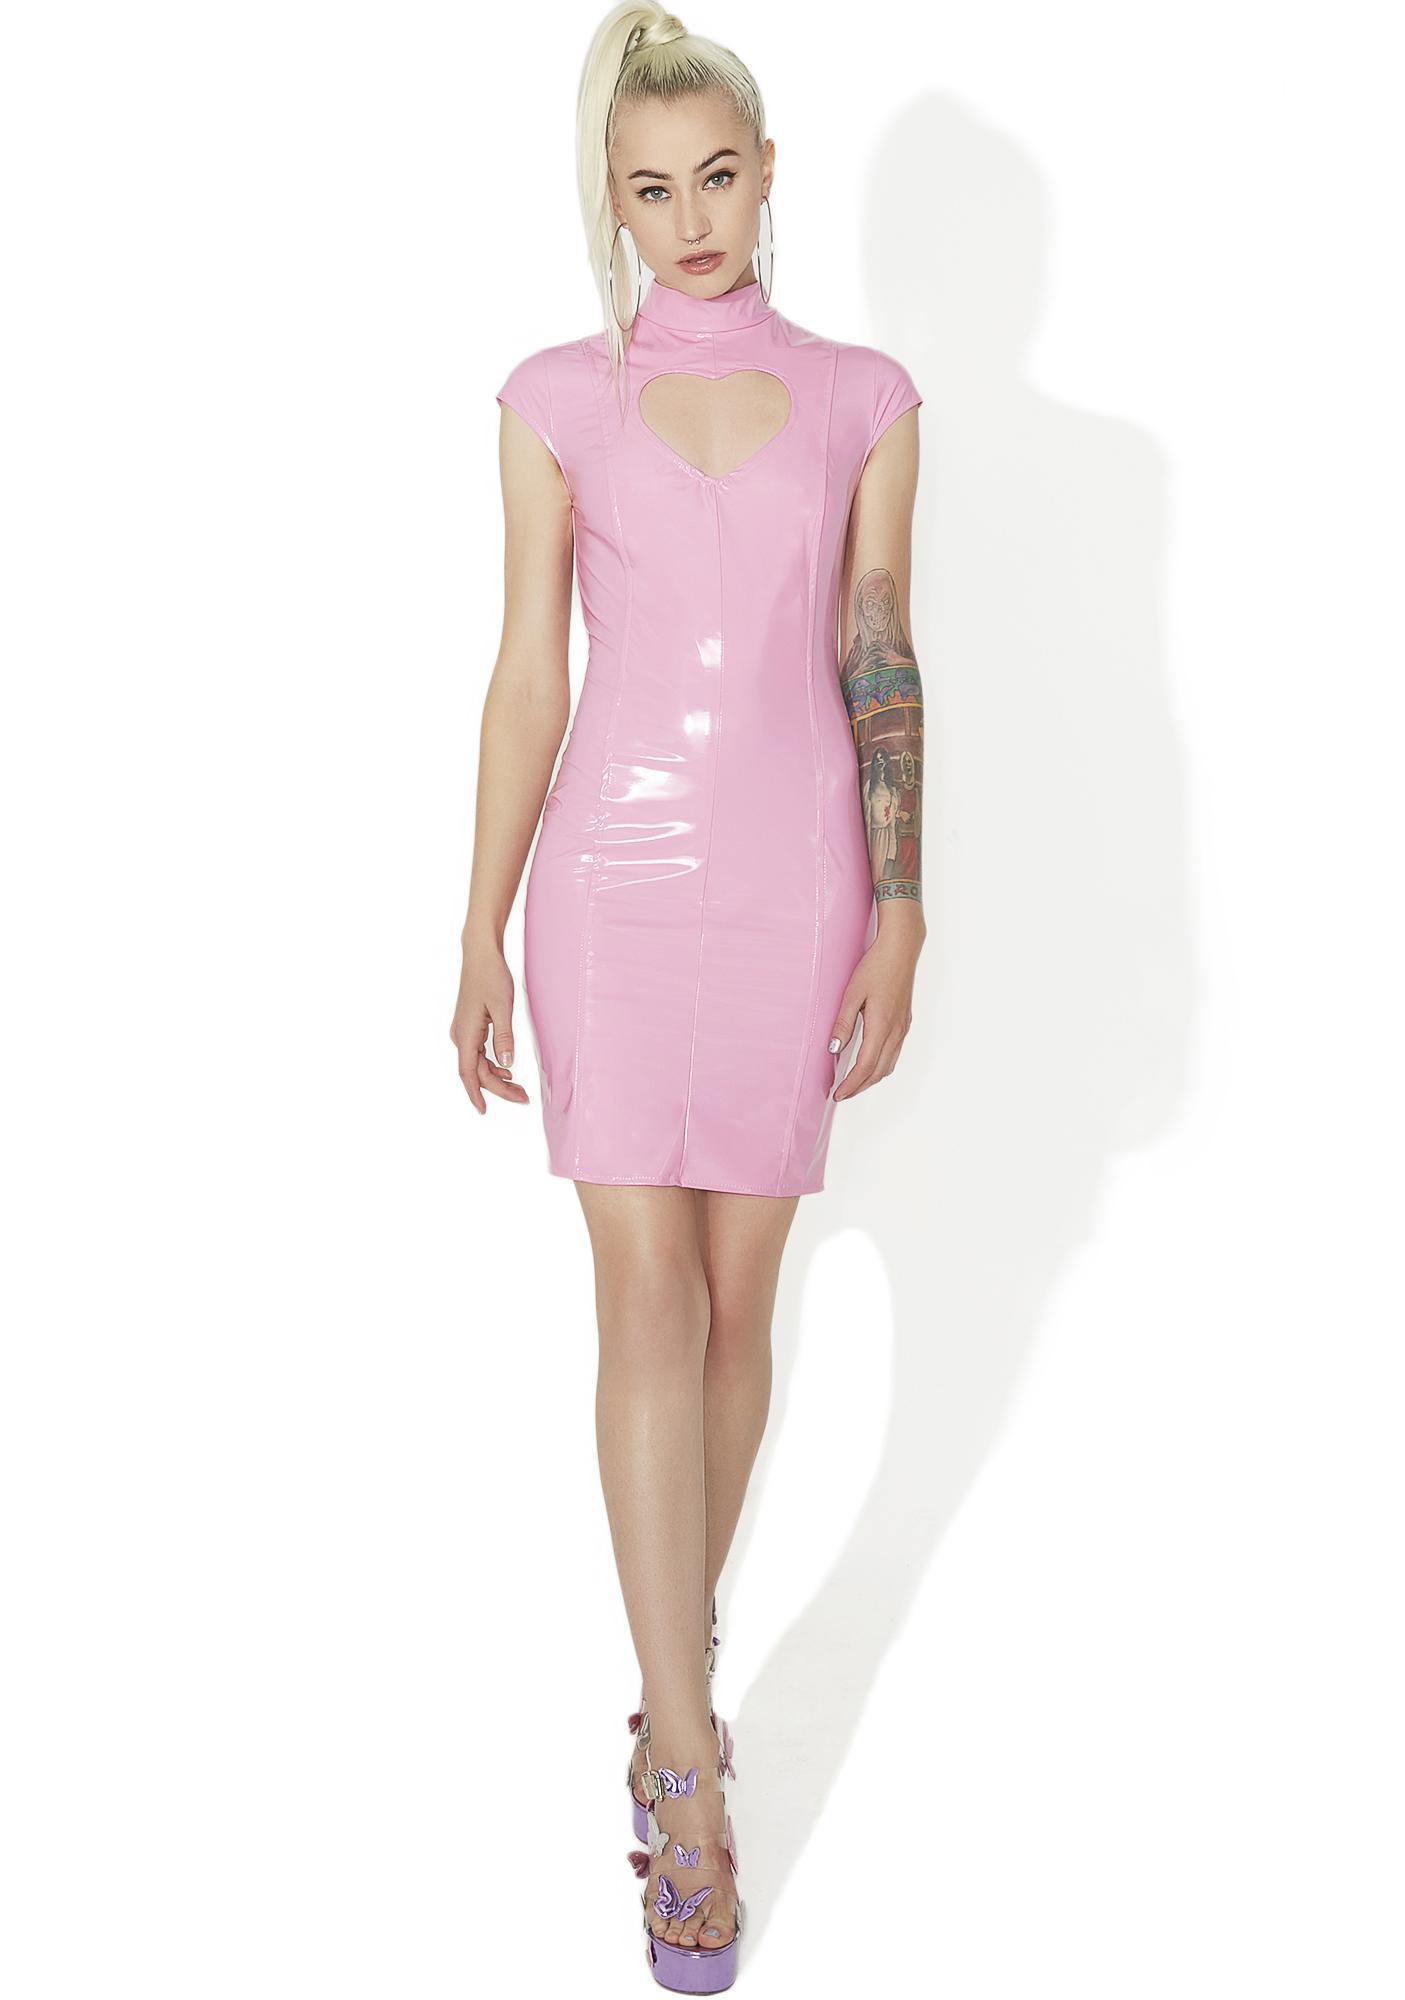 Heartbeatz Cut-Out Bodycon Dress